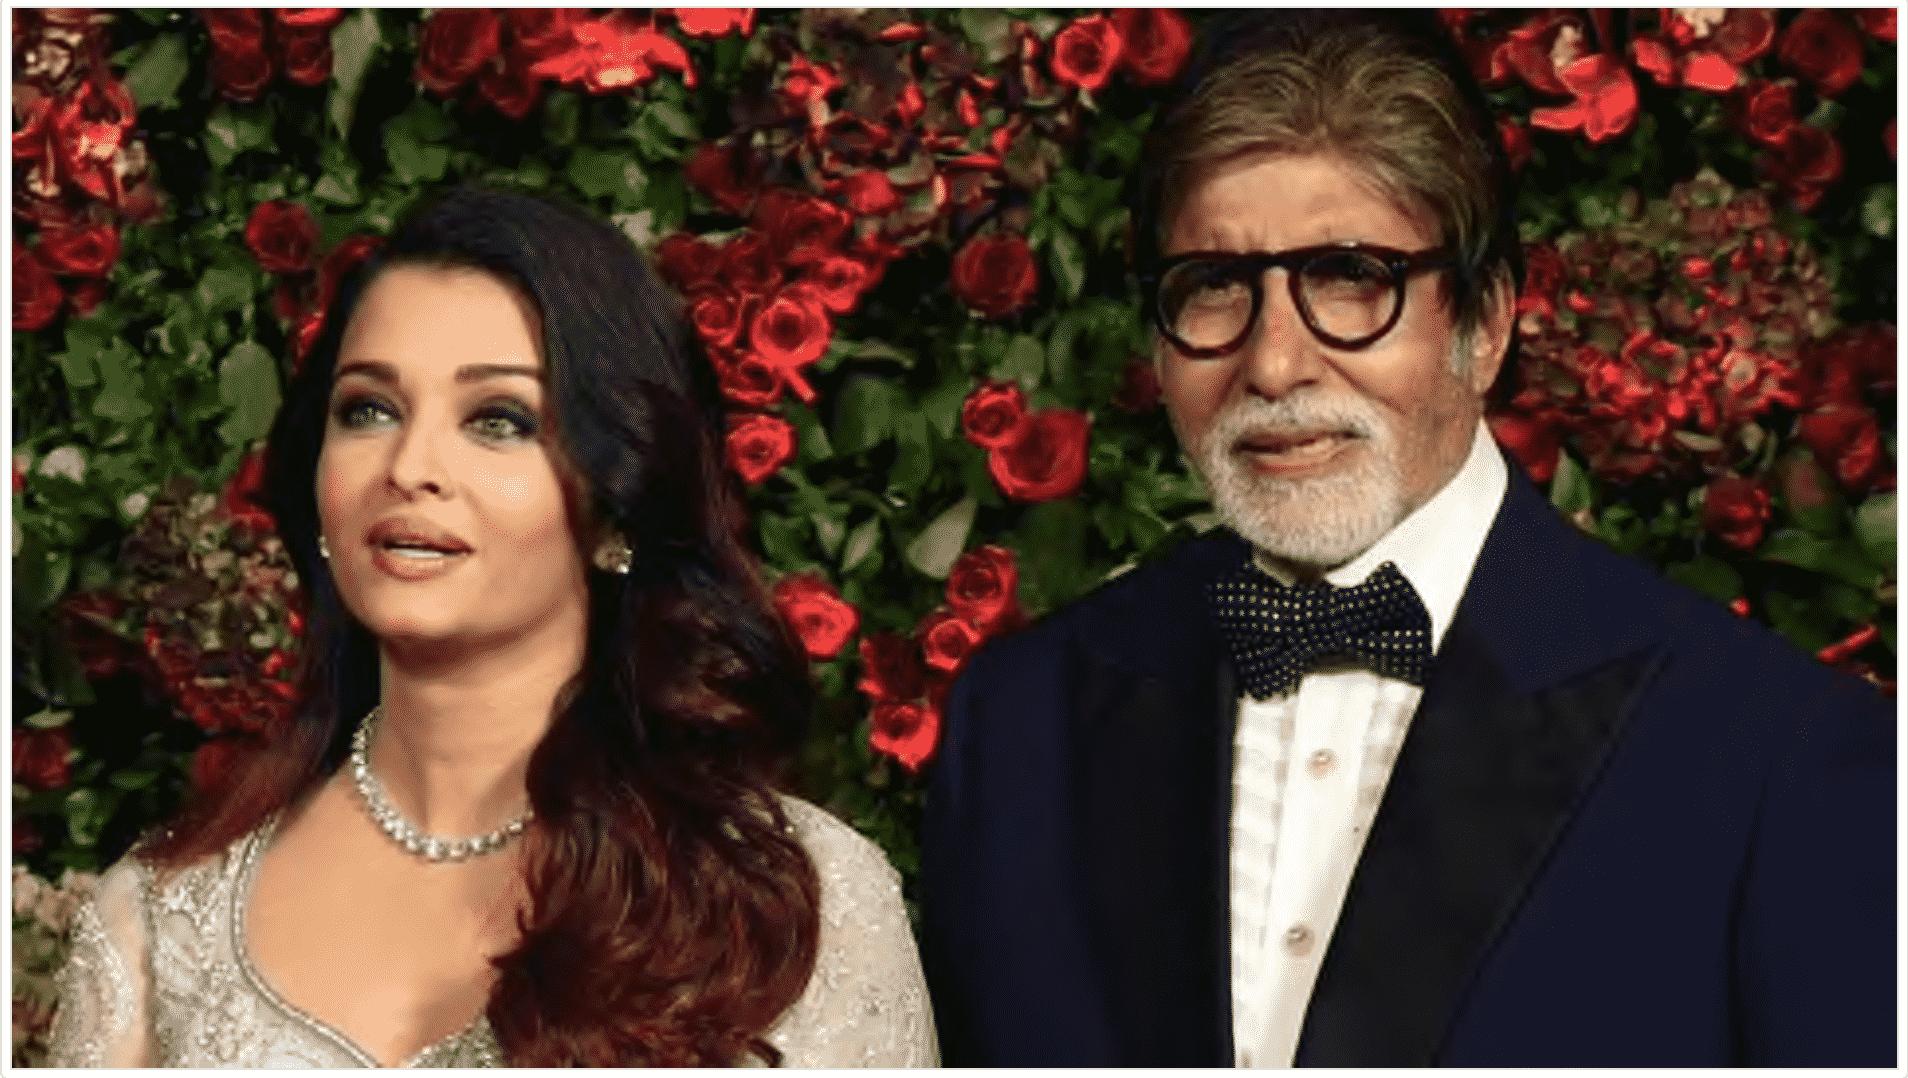 Aishwarya Rai and Amitabh Bachchan to work together in Mani Ratnam's period film? 1